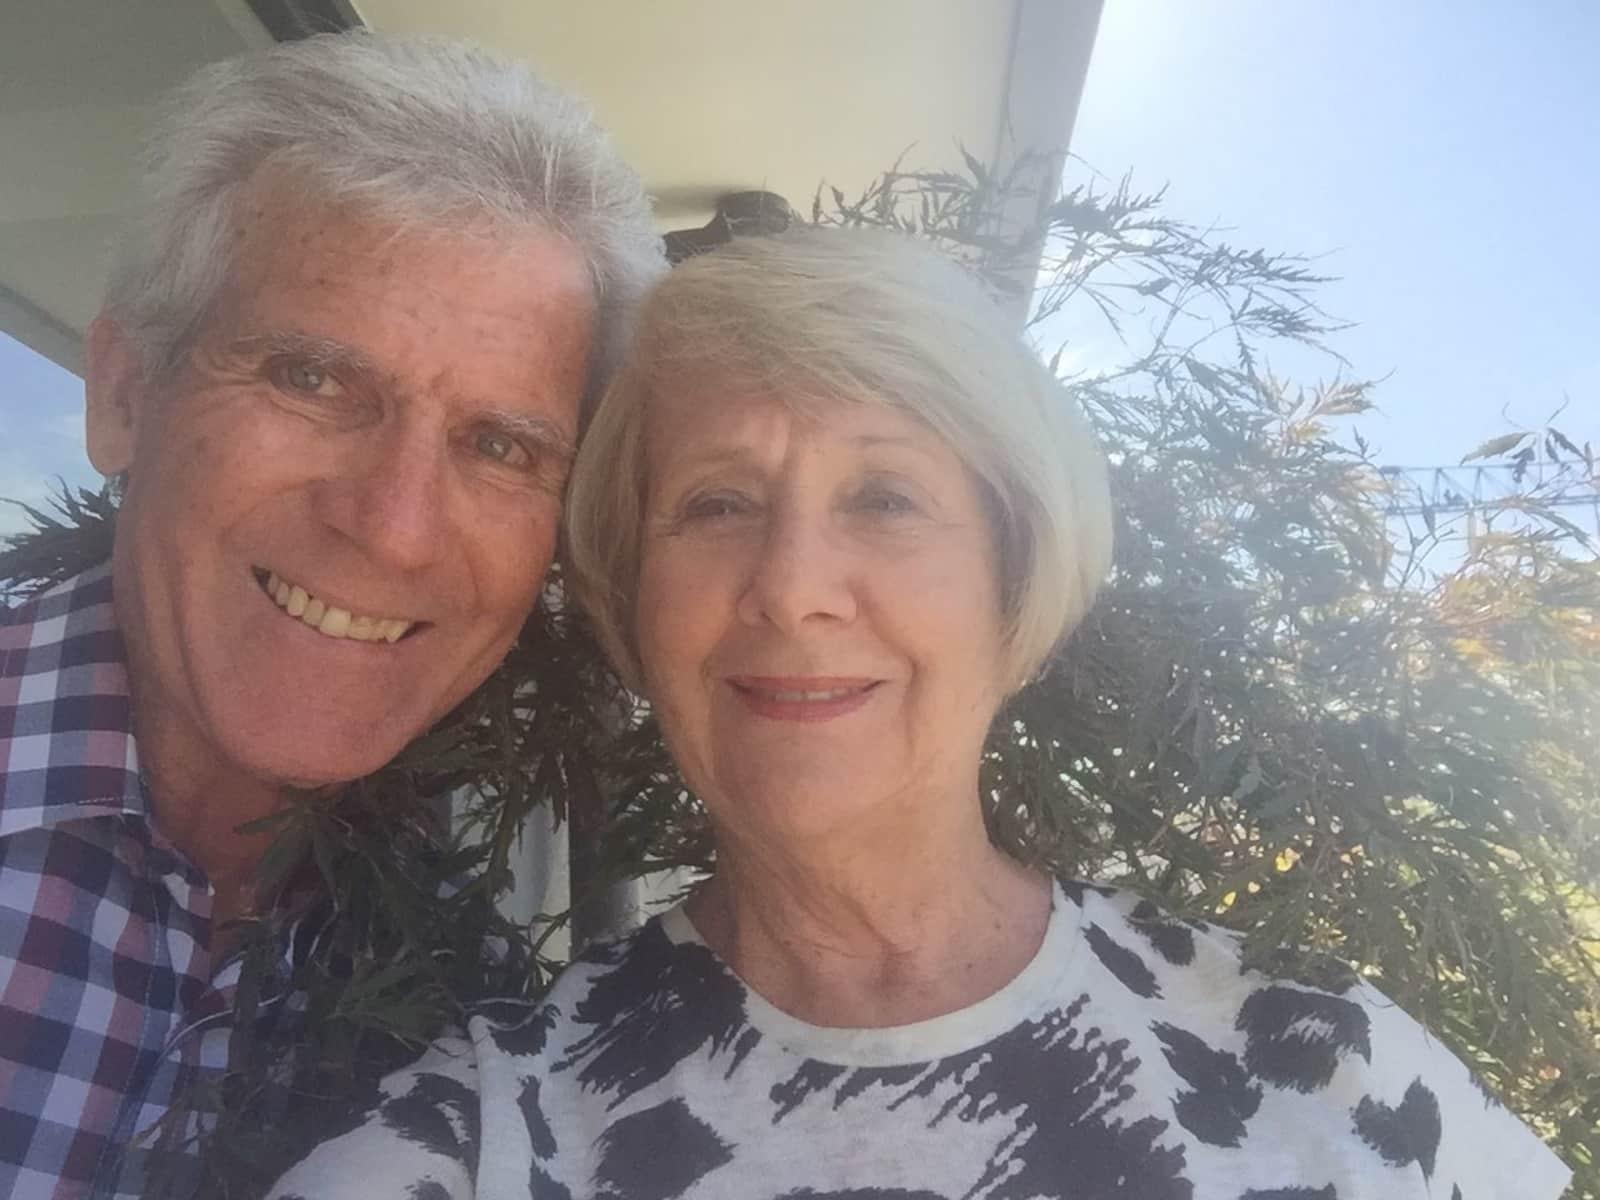 Leigh & john & John from Melbourne, Victoria, Australia